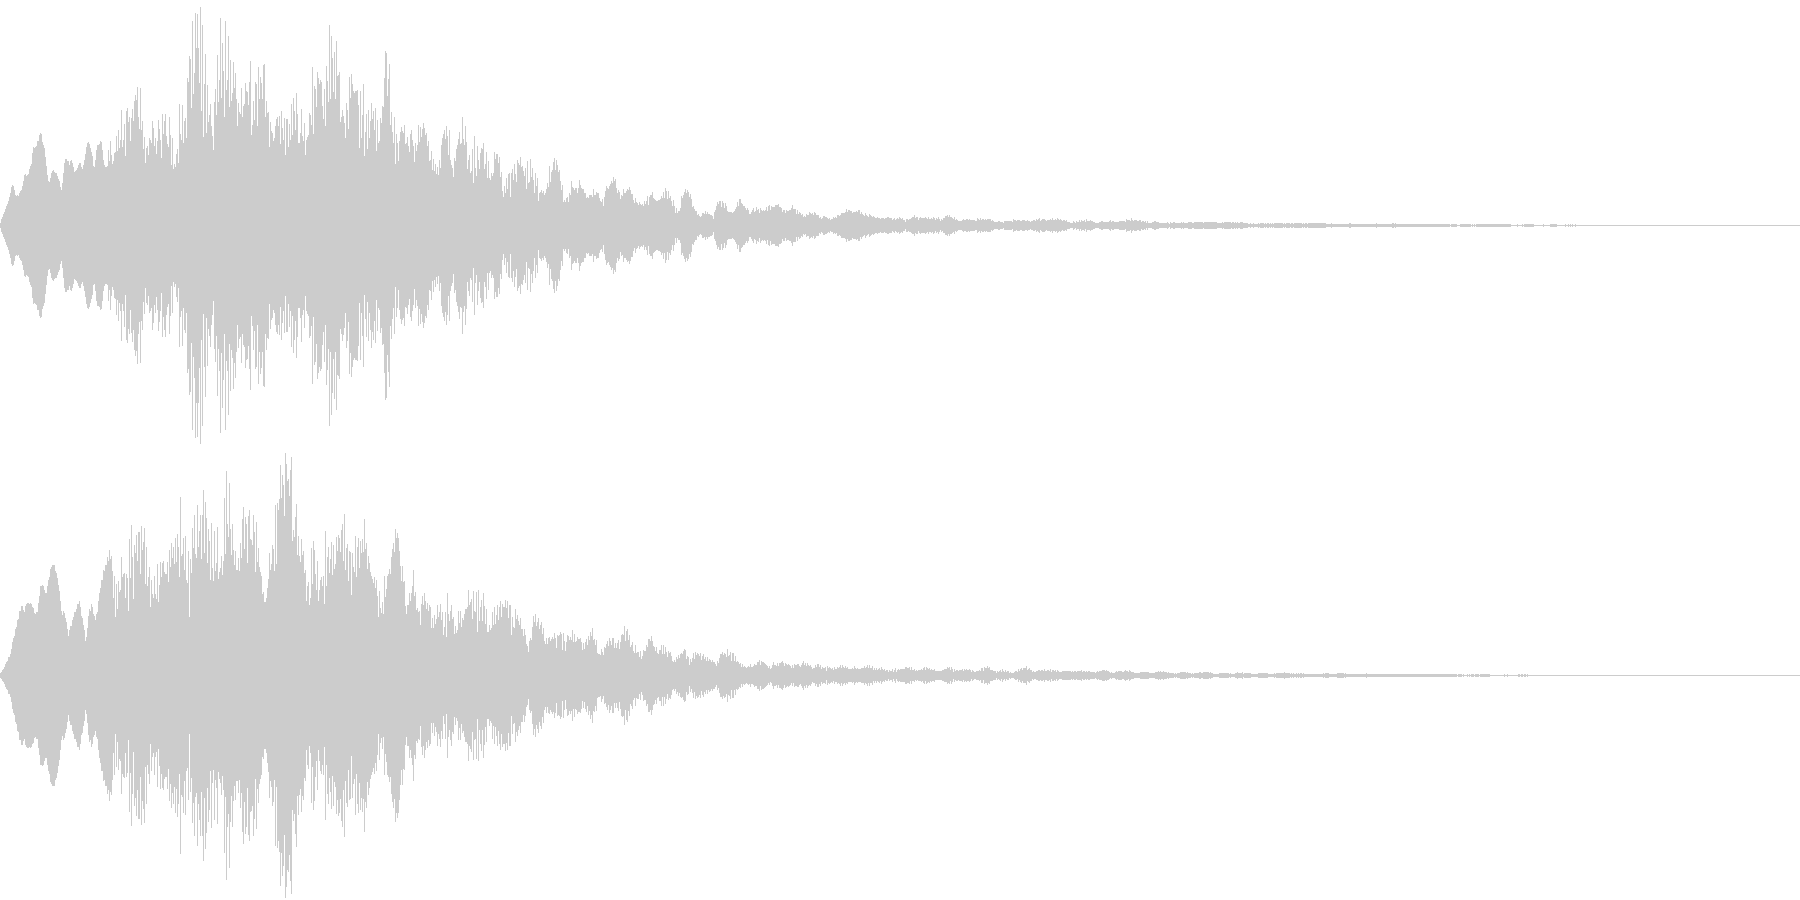 Level 短めのレベルアップSE 1の未再生の波形